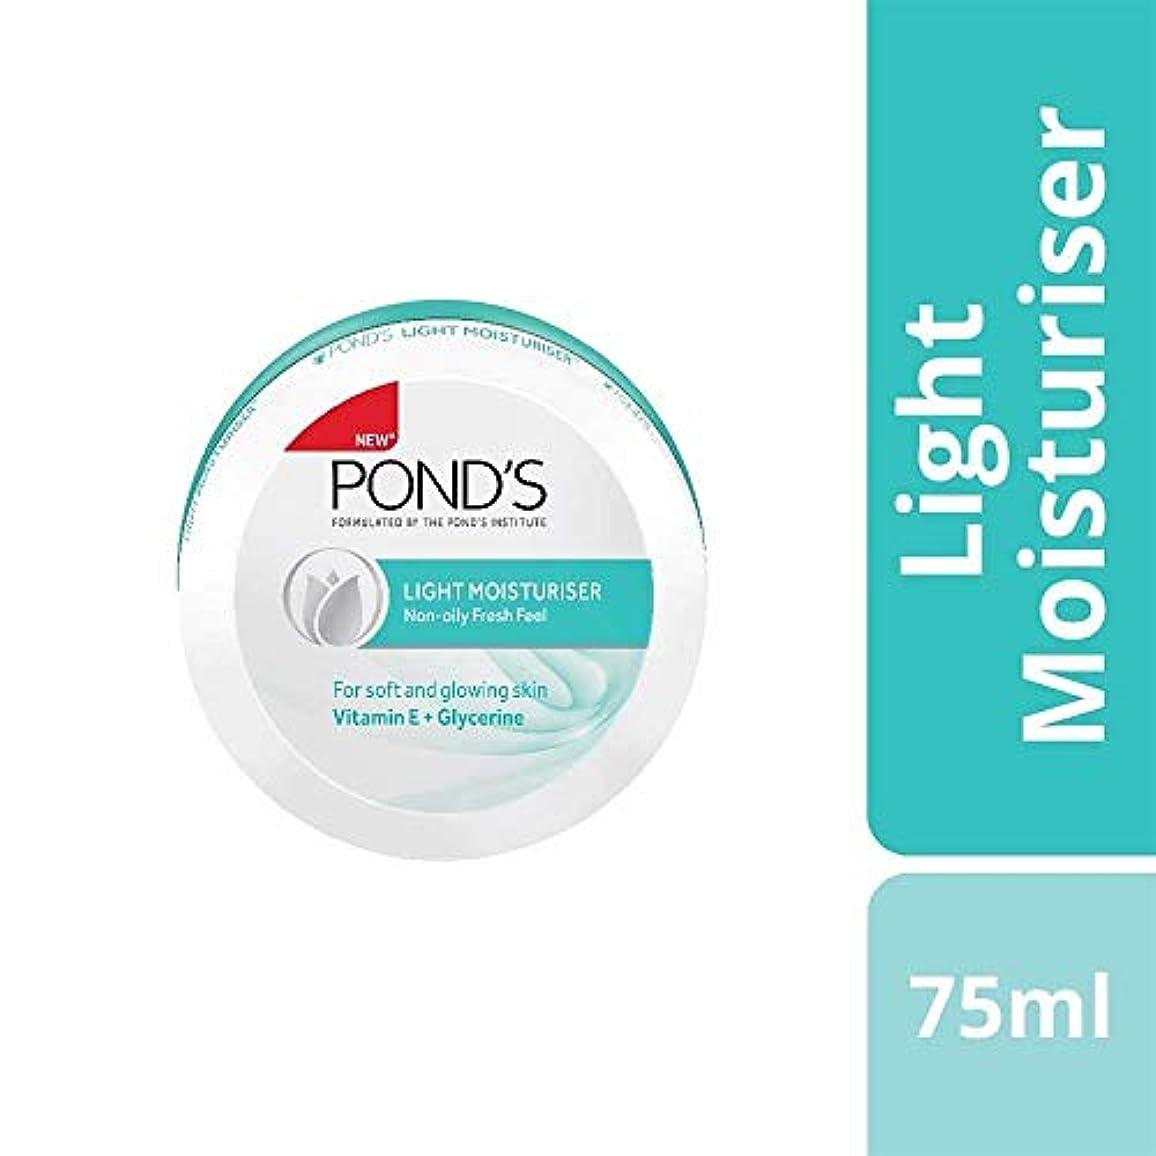 リーク気分帳面Ponds Light Moisturiser 75 ML - India